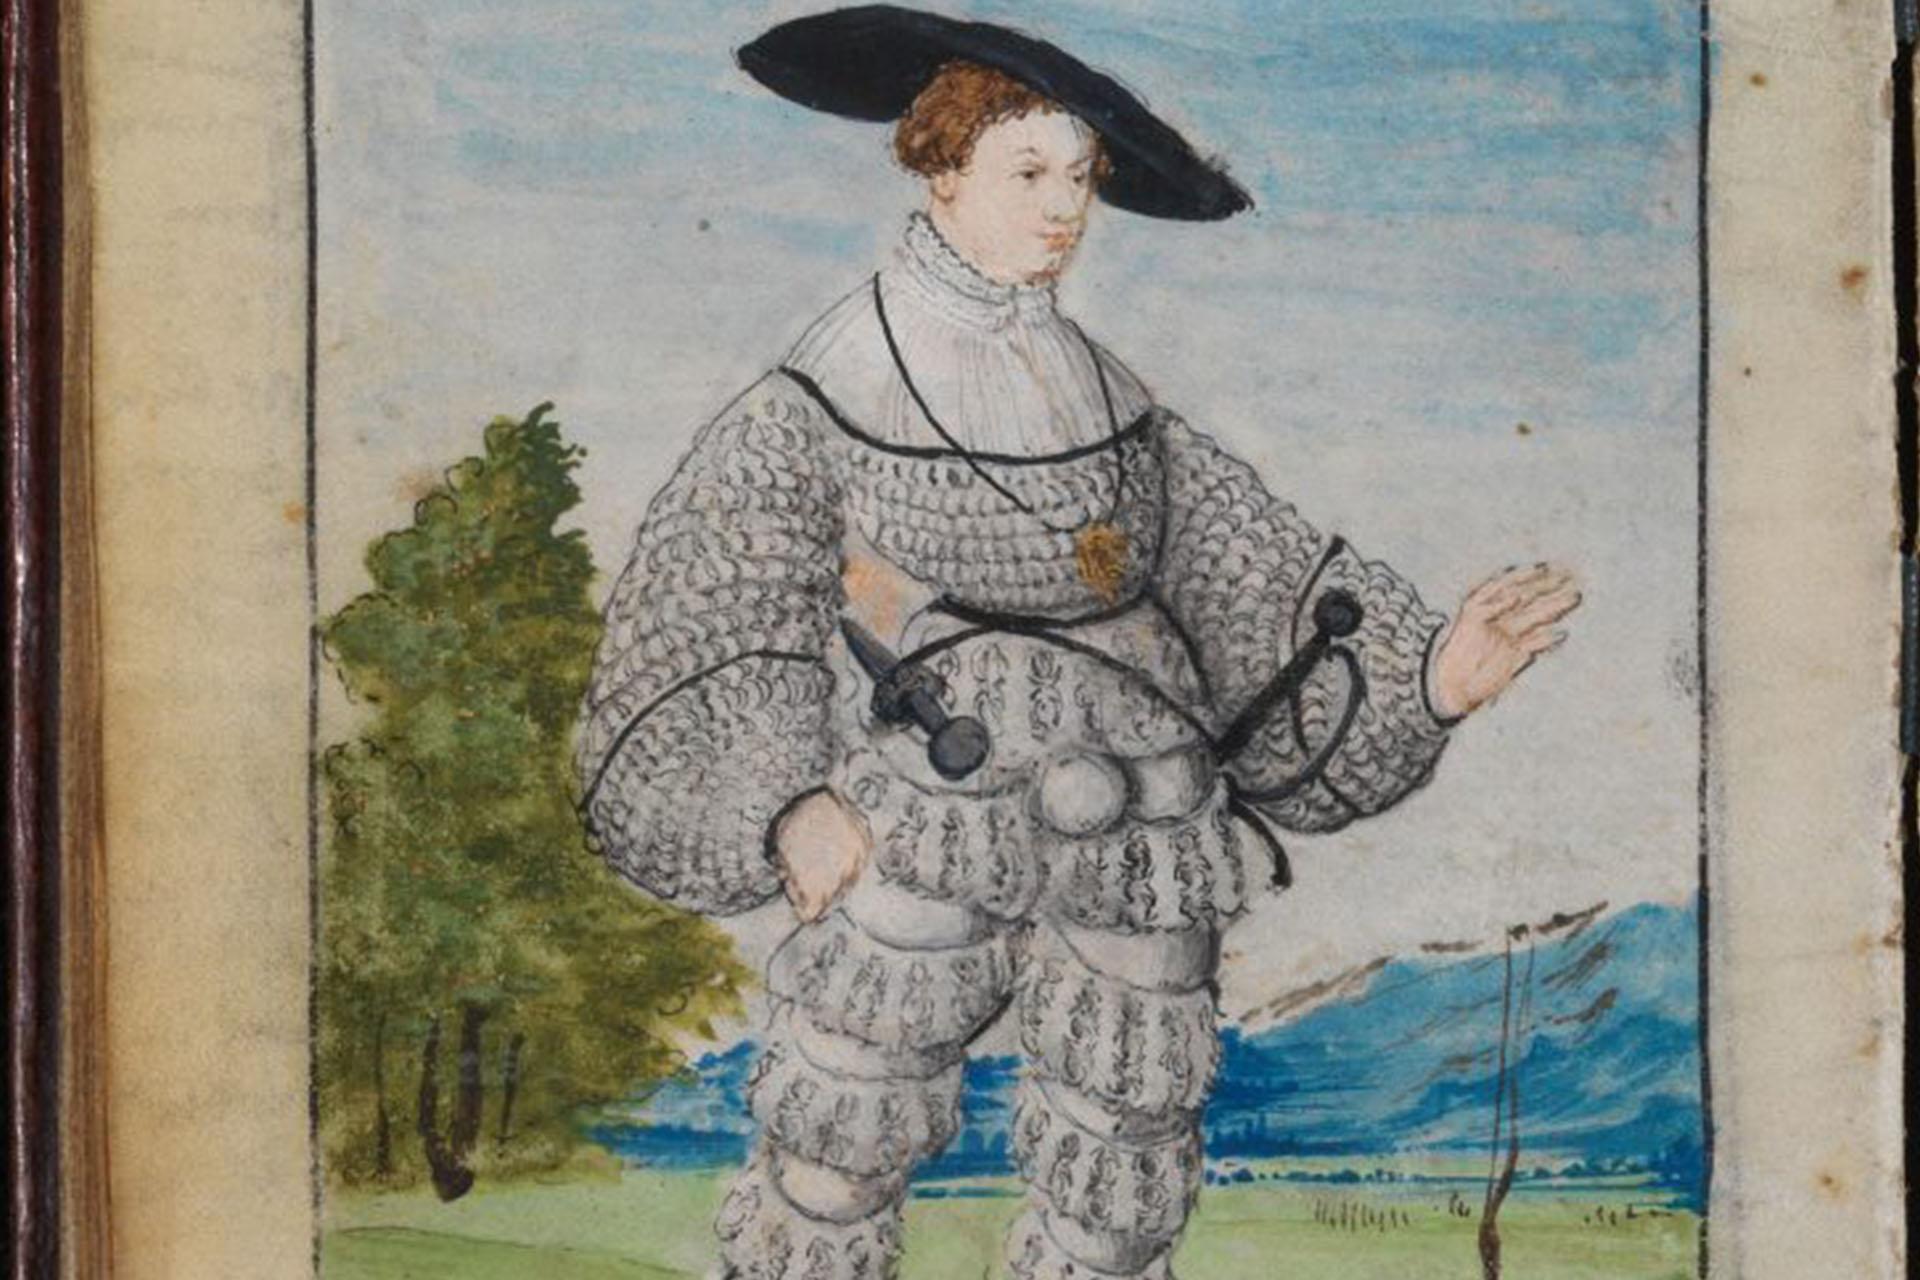 Illustration aquarelle représentant Matthäus Schwarz